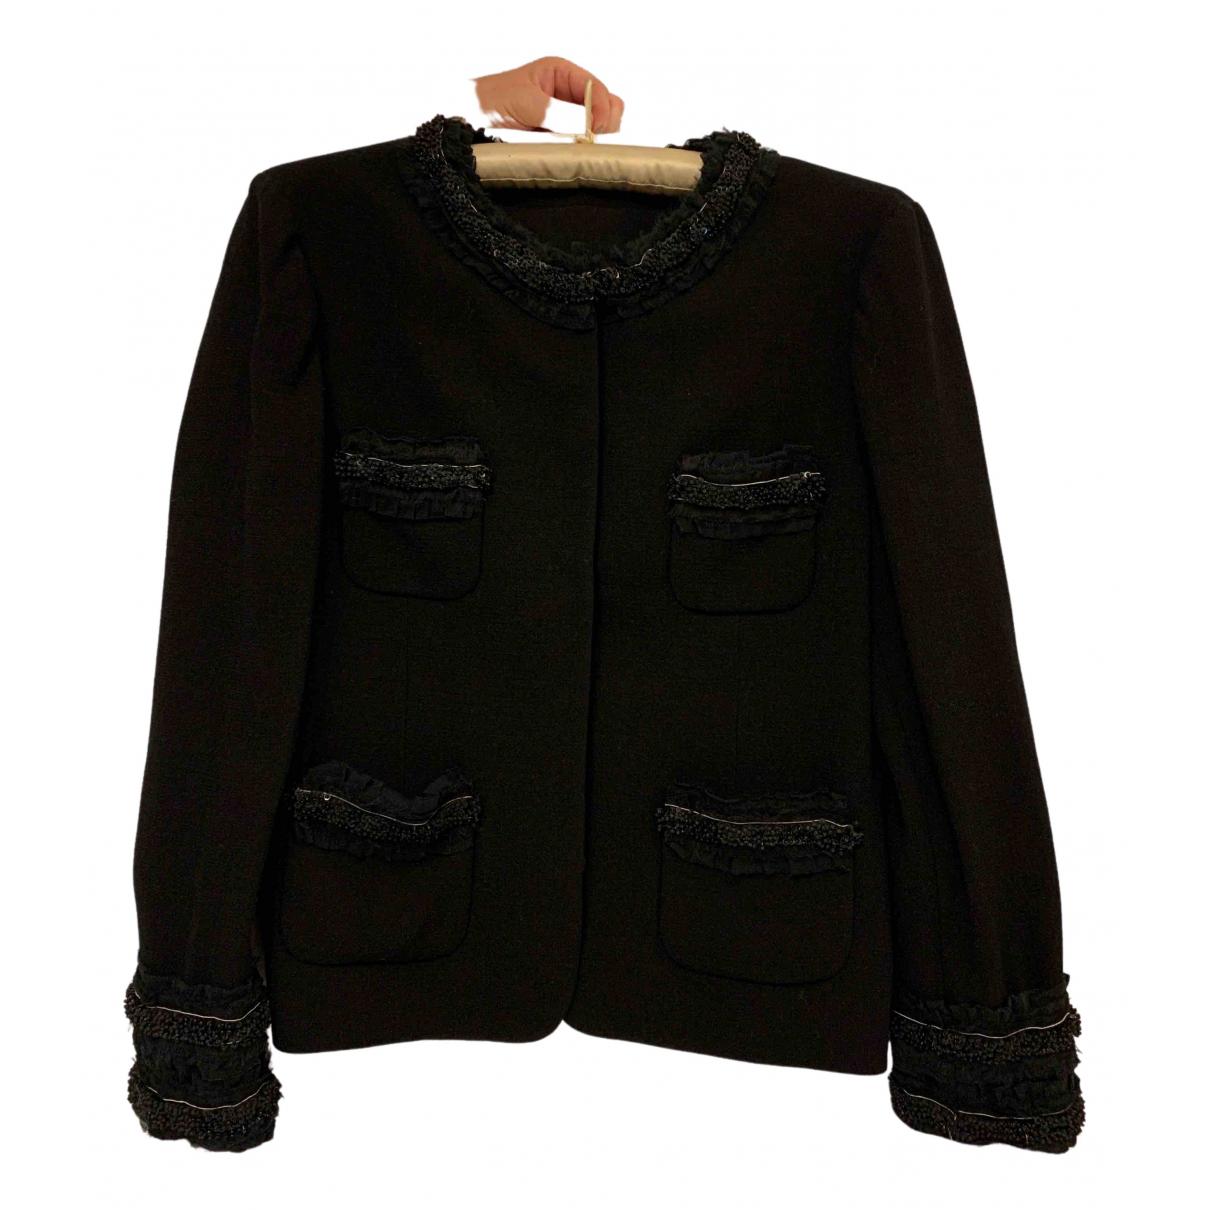 D&g \N Black jacket for Women 46 FR